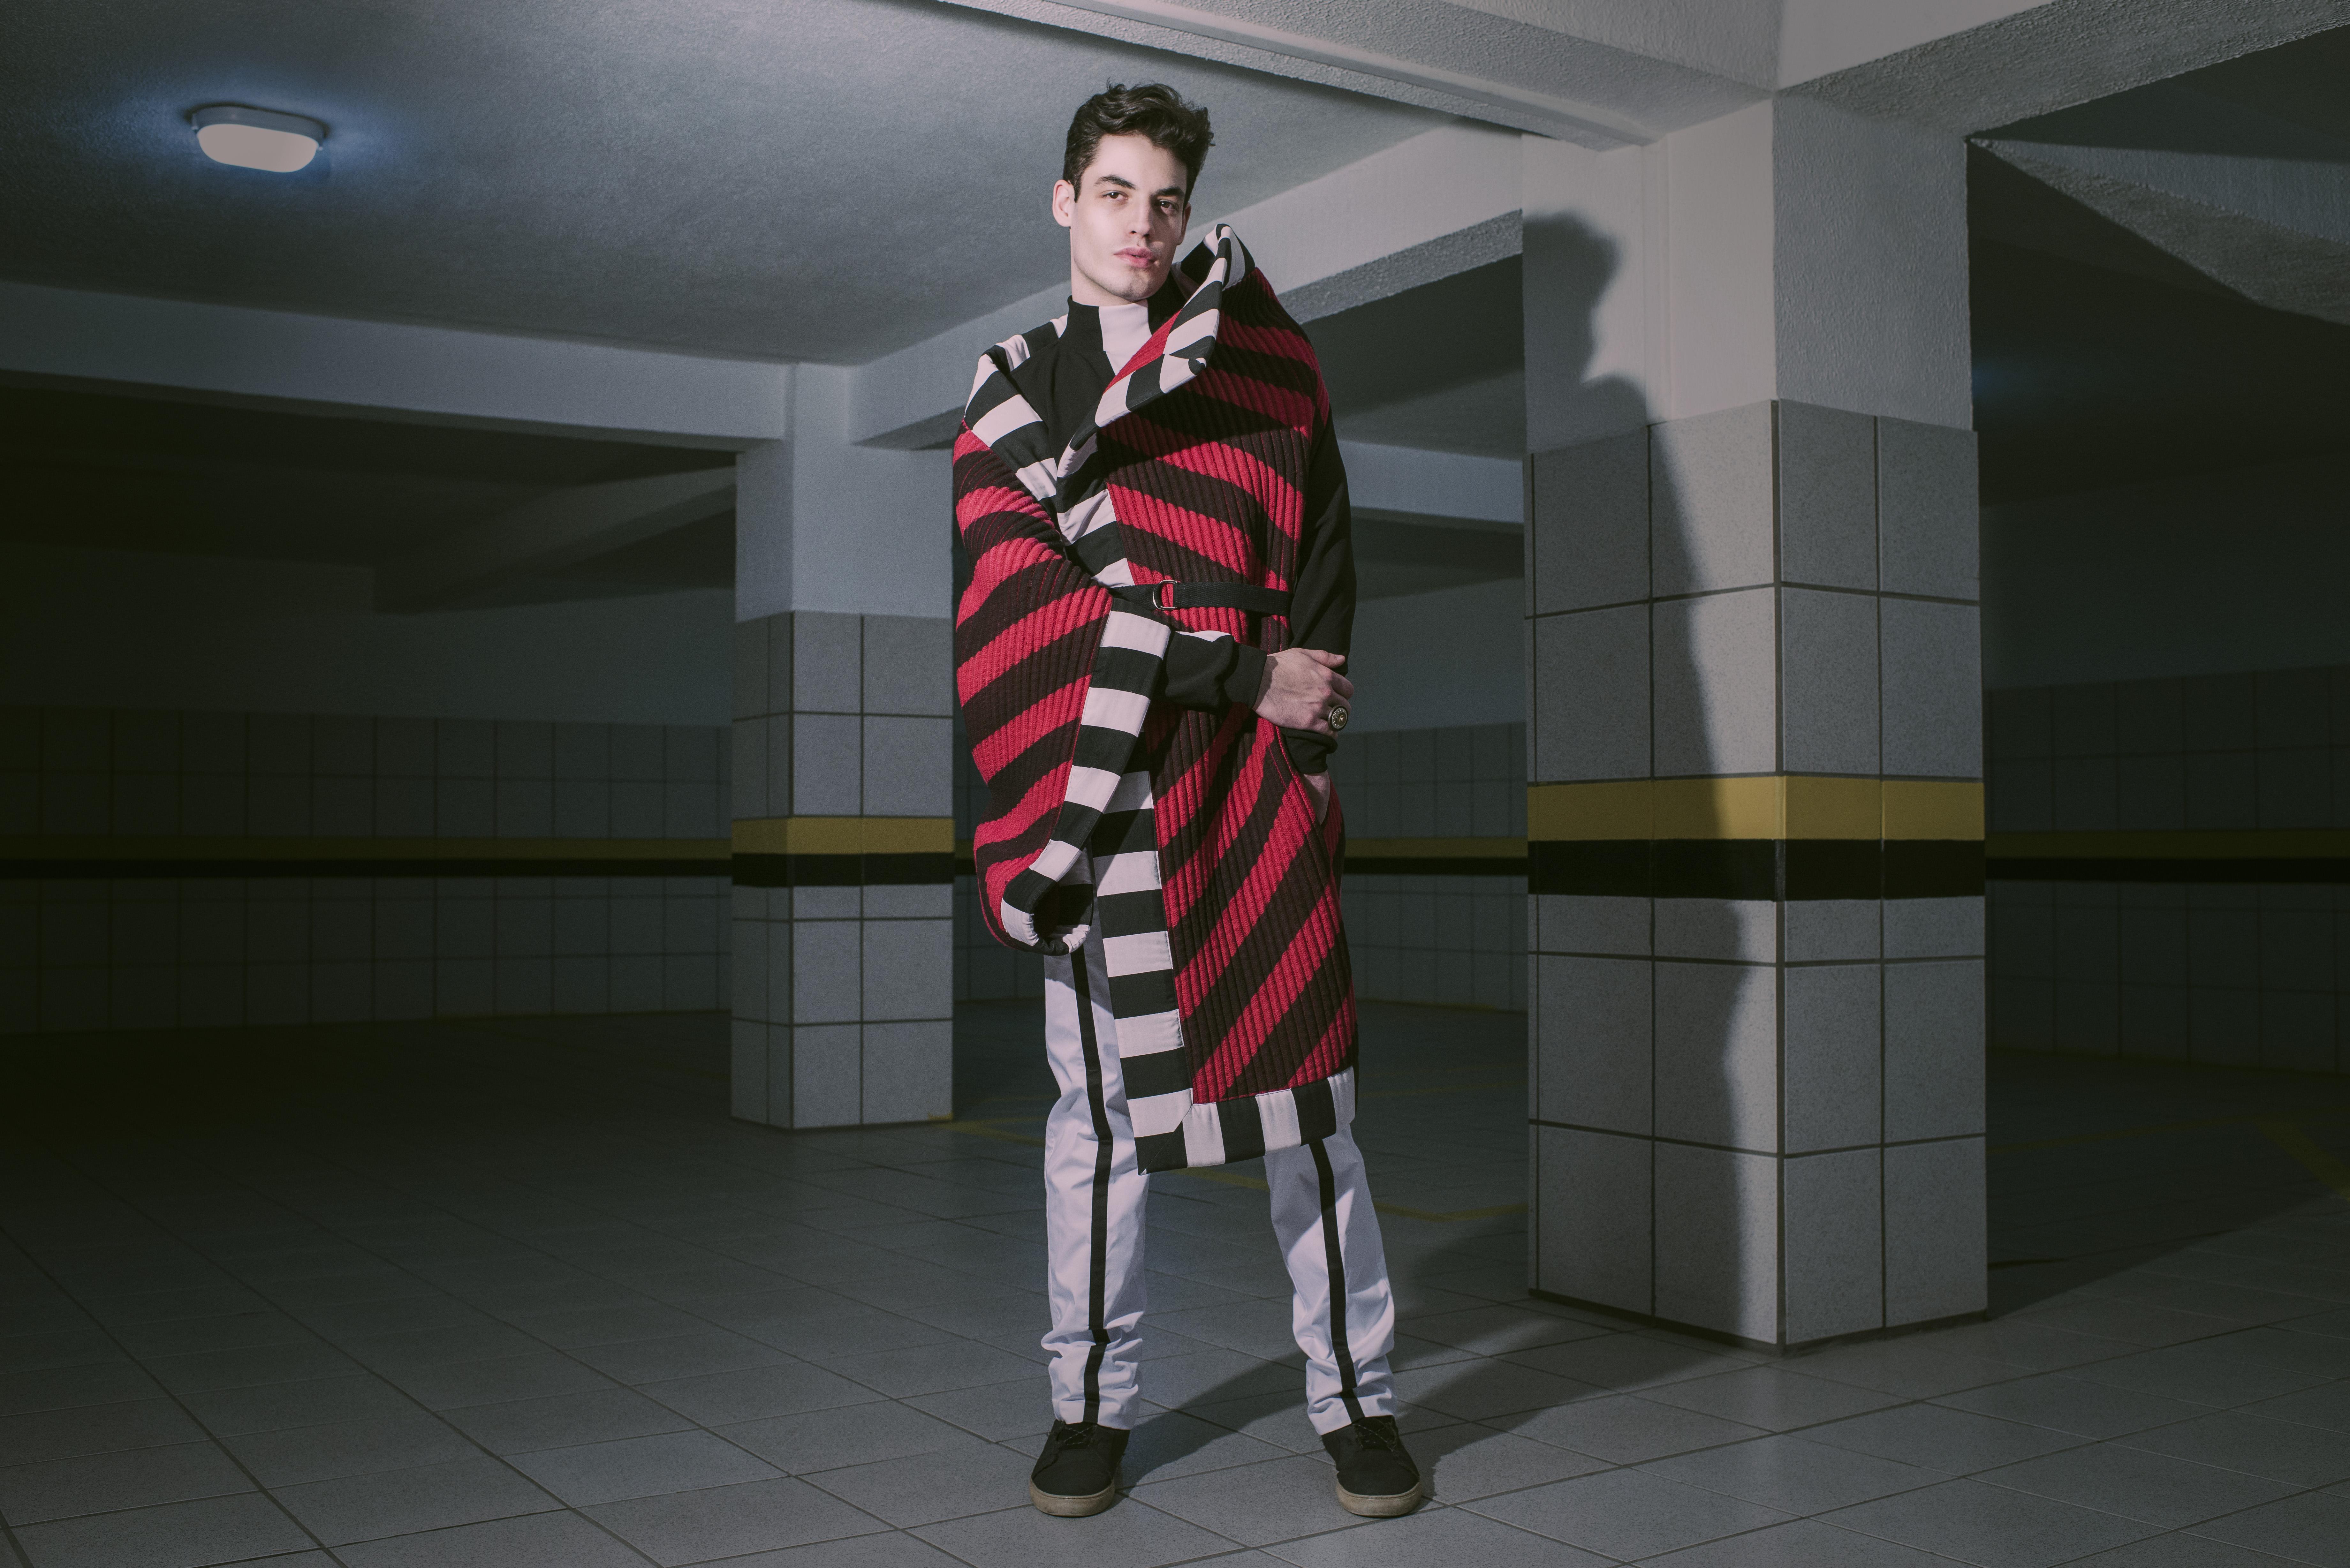 Marcos Medeiros Fotógrafo